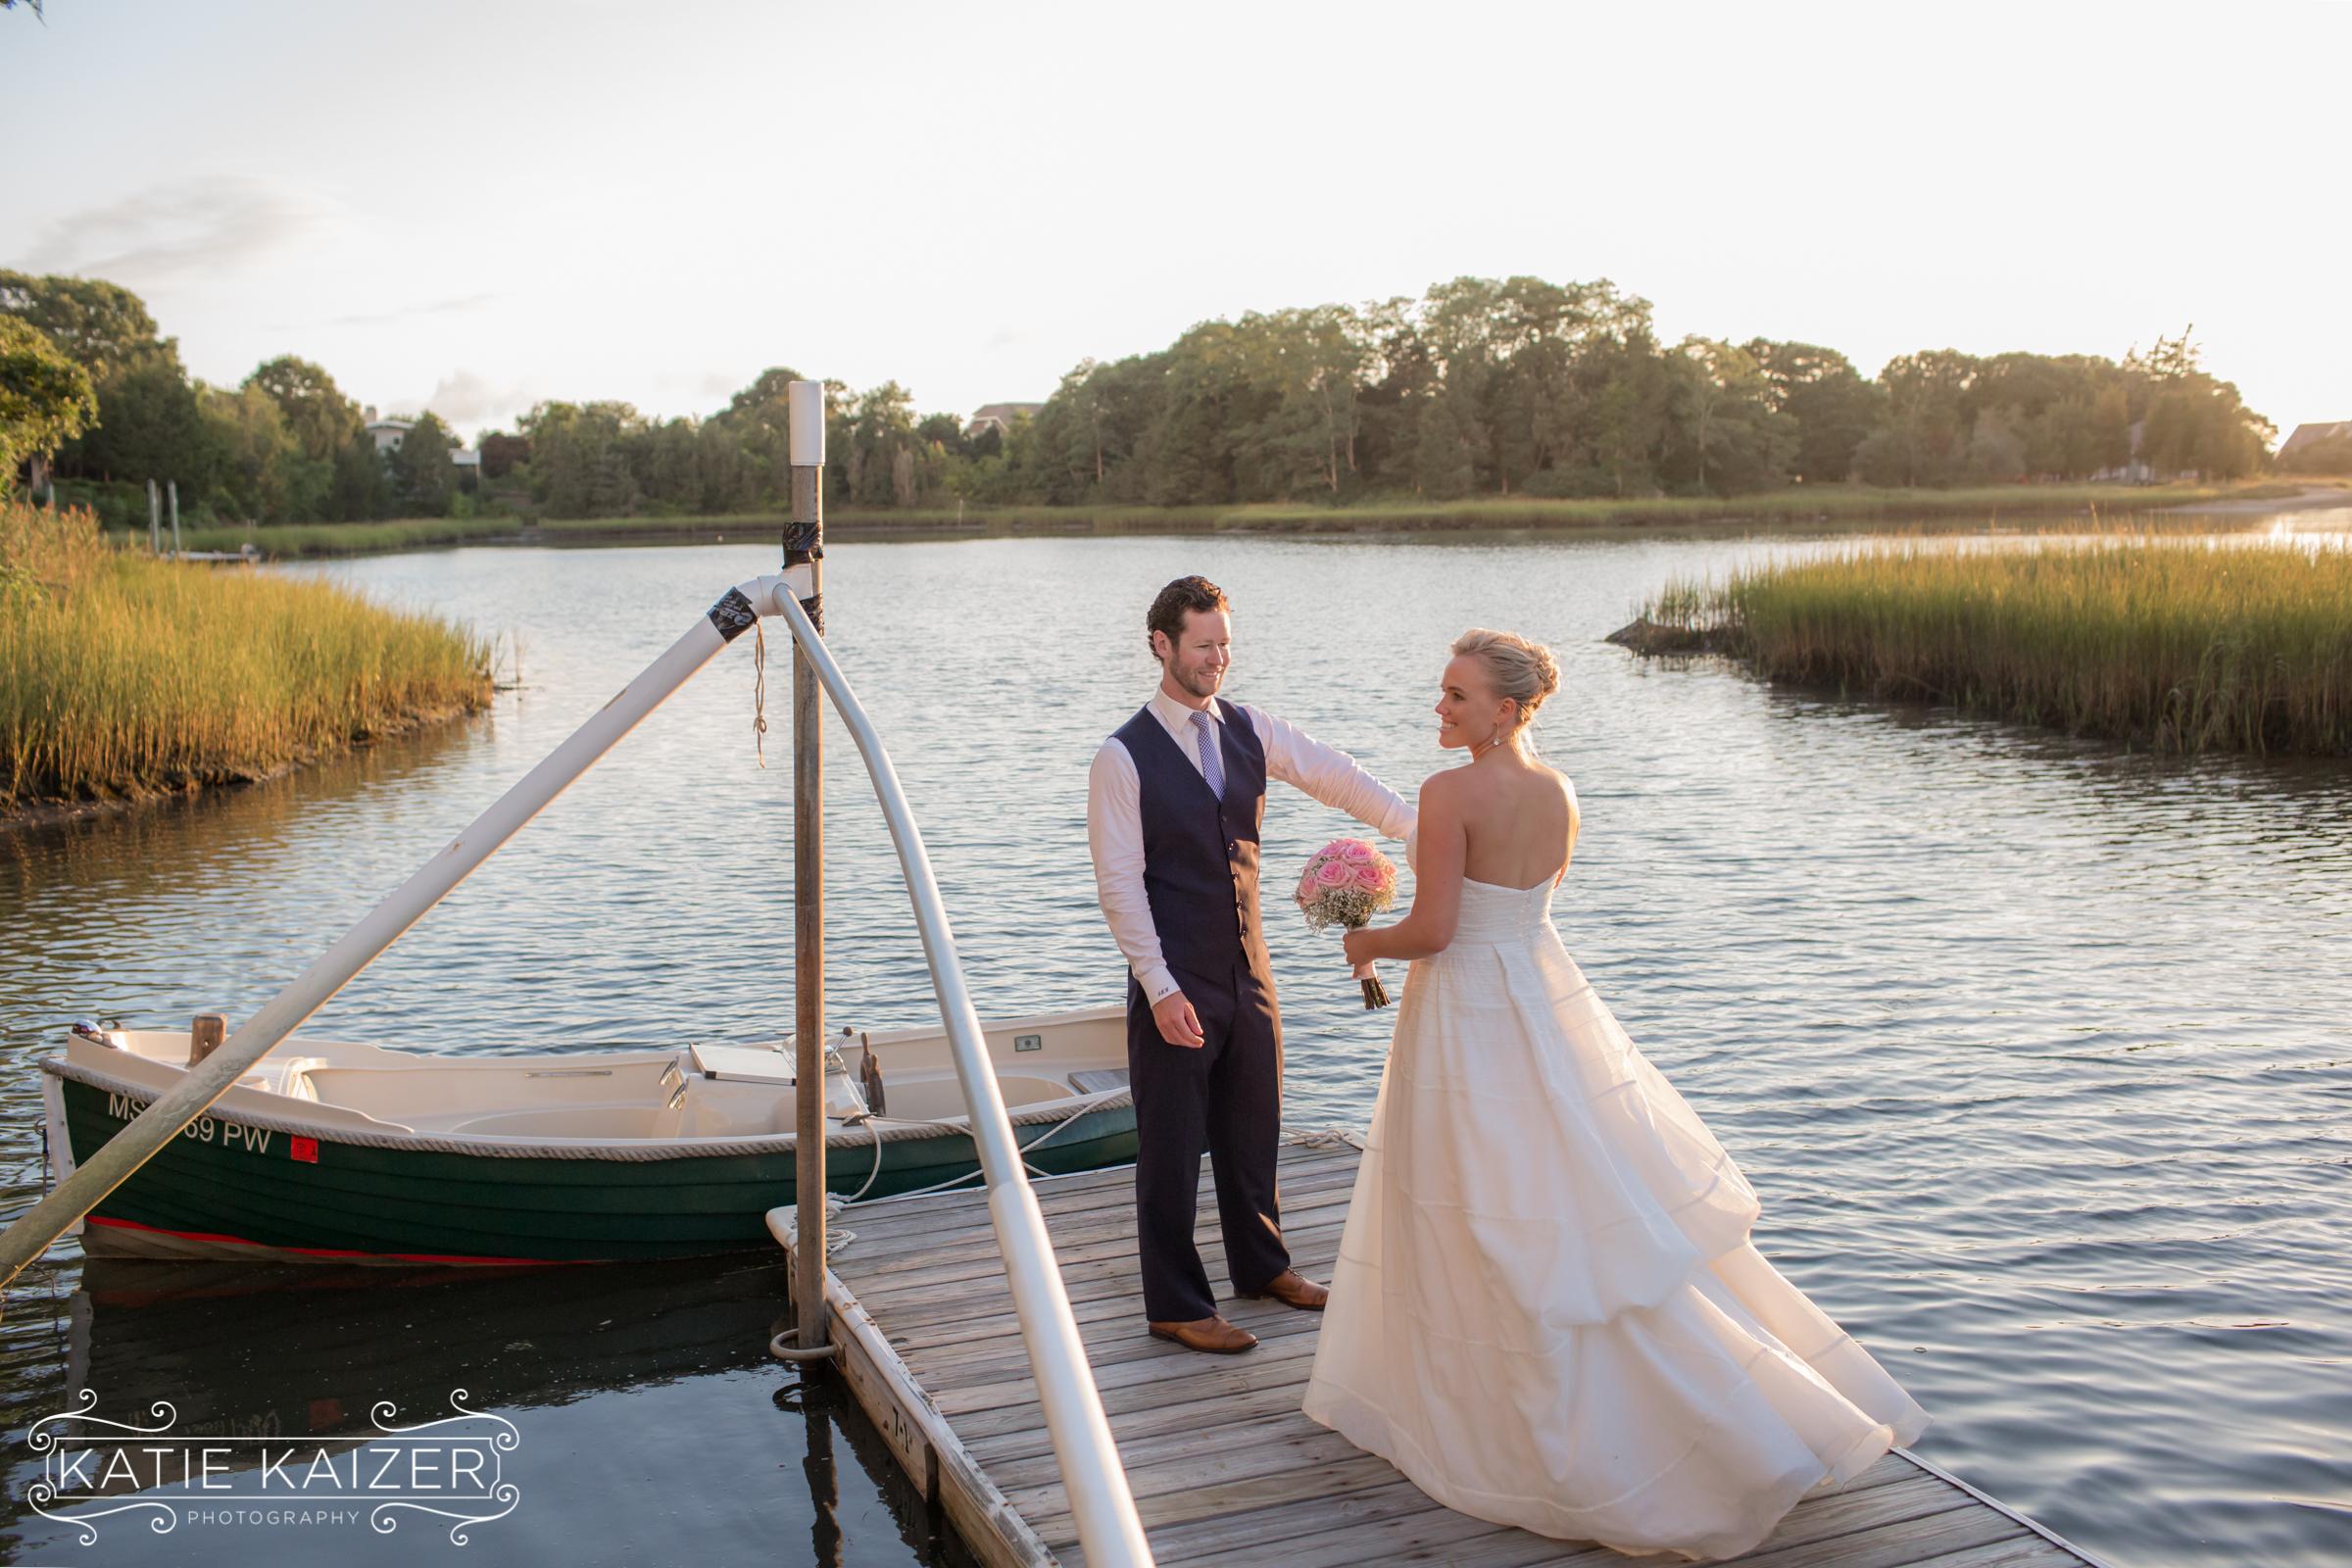 Meaghan&Tim_137_KatieKaizerPhotography